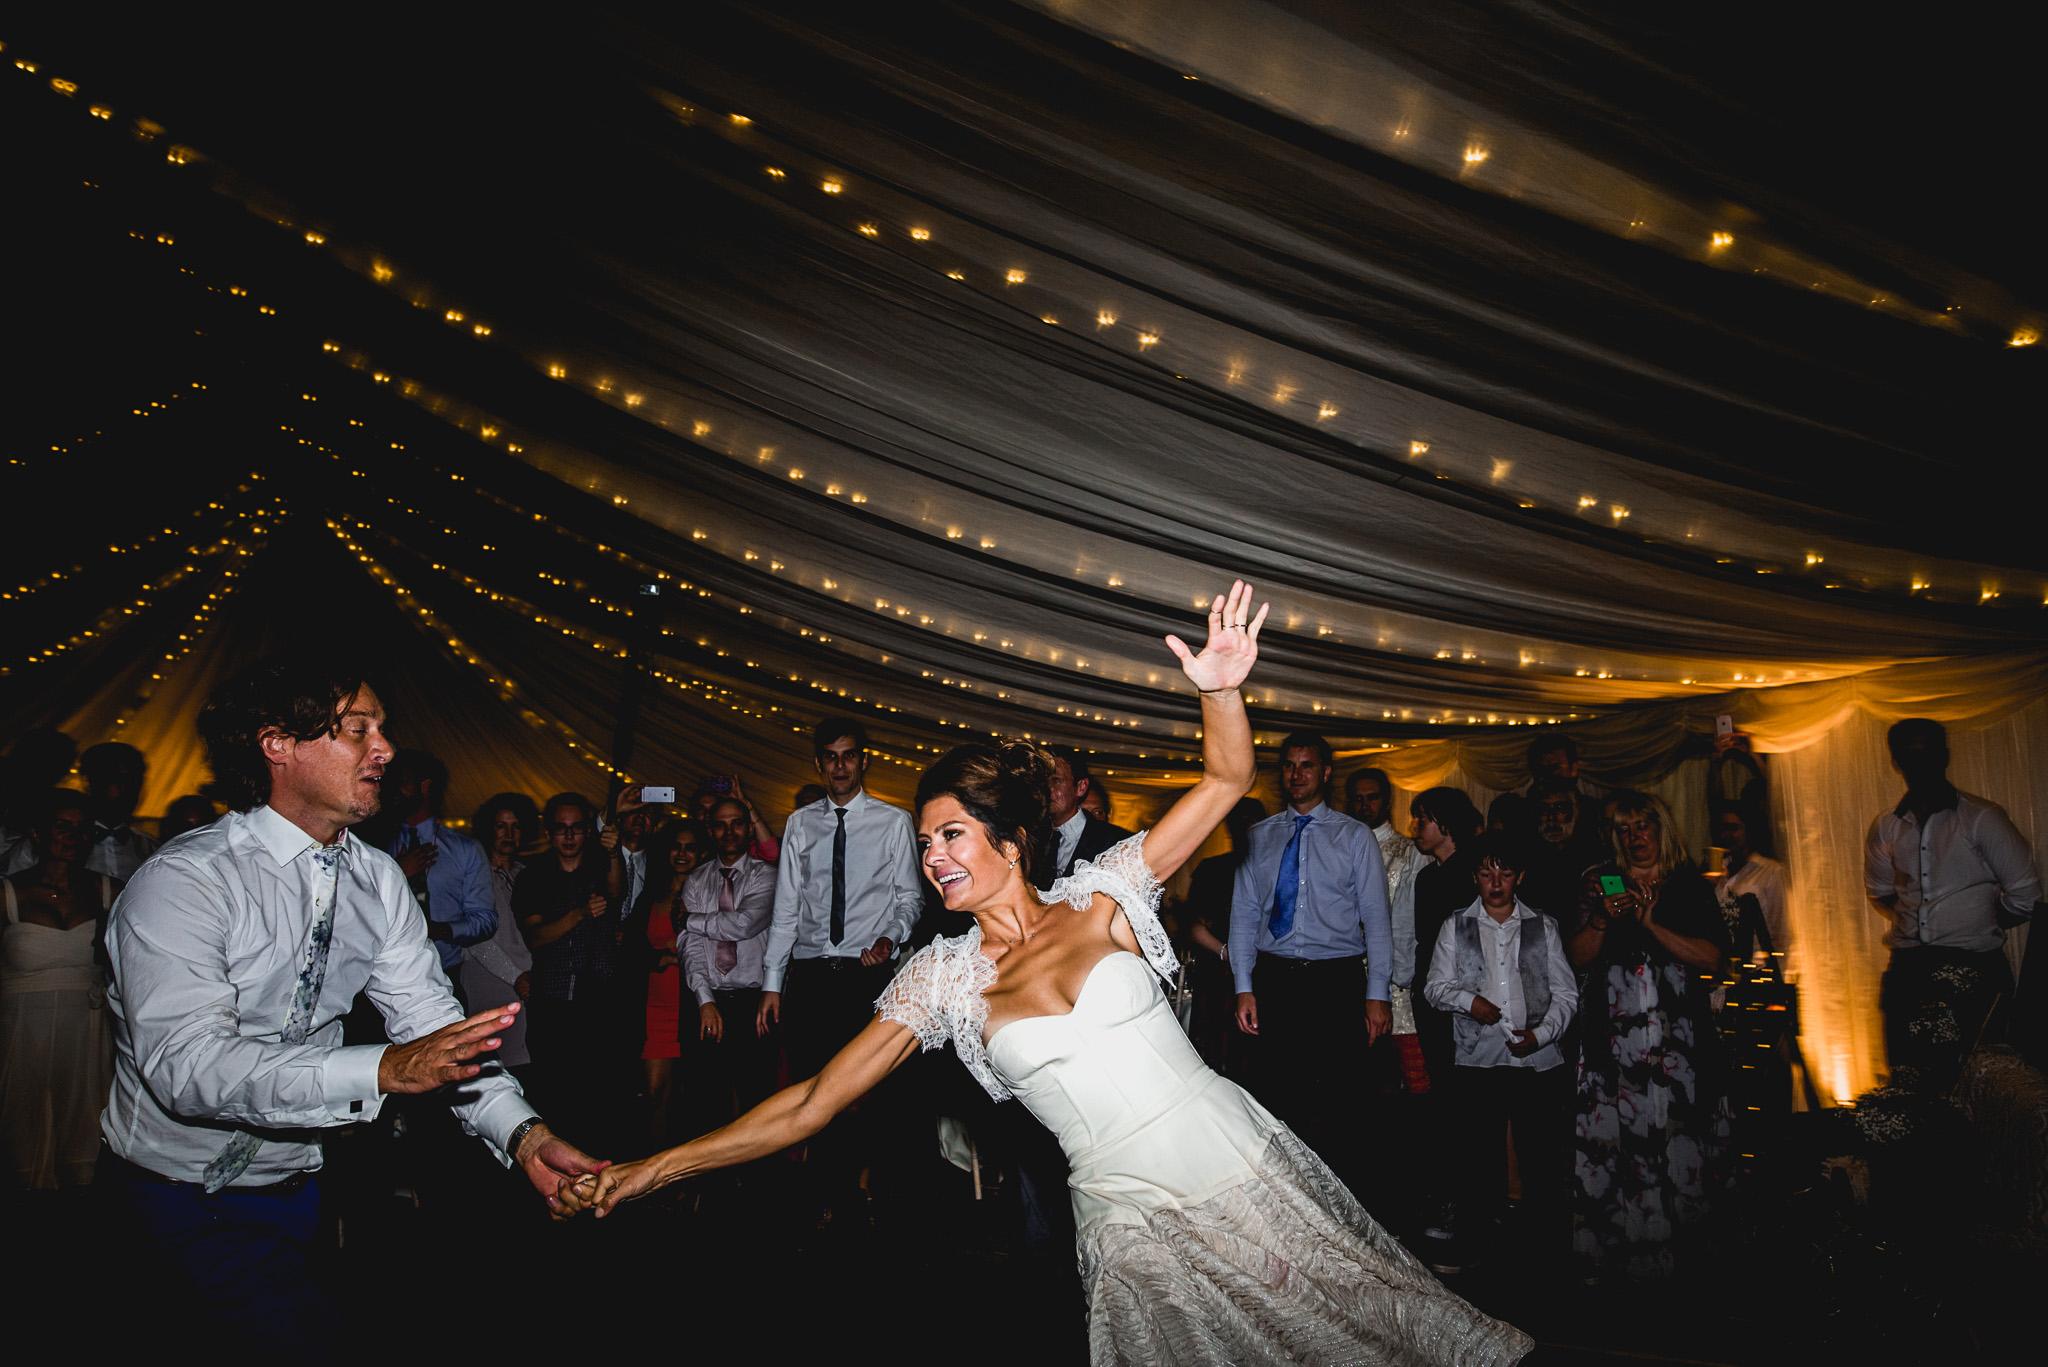 Lara & Jack Wedding 220815 by Barney Walters_1060_BW2_1086